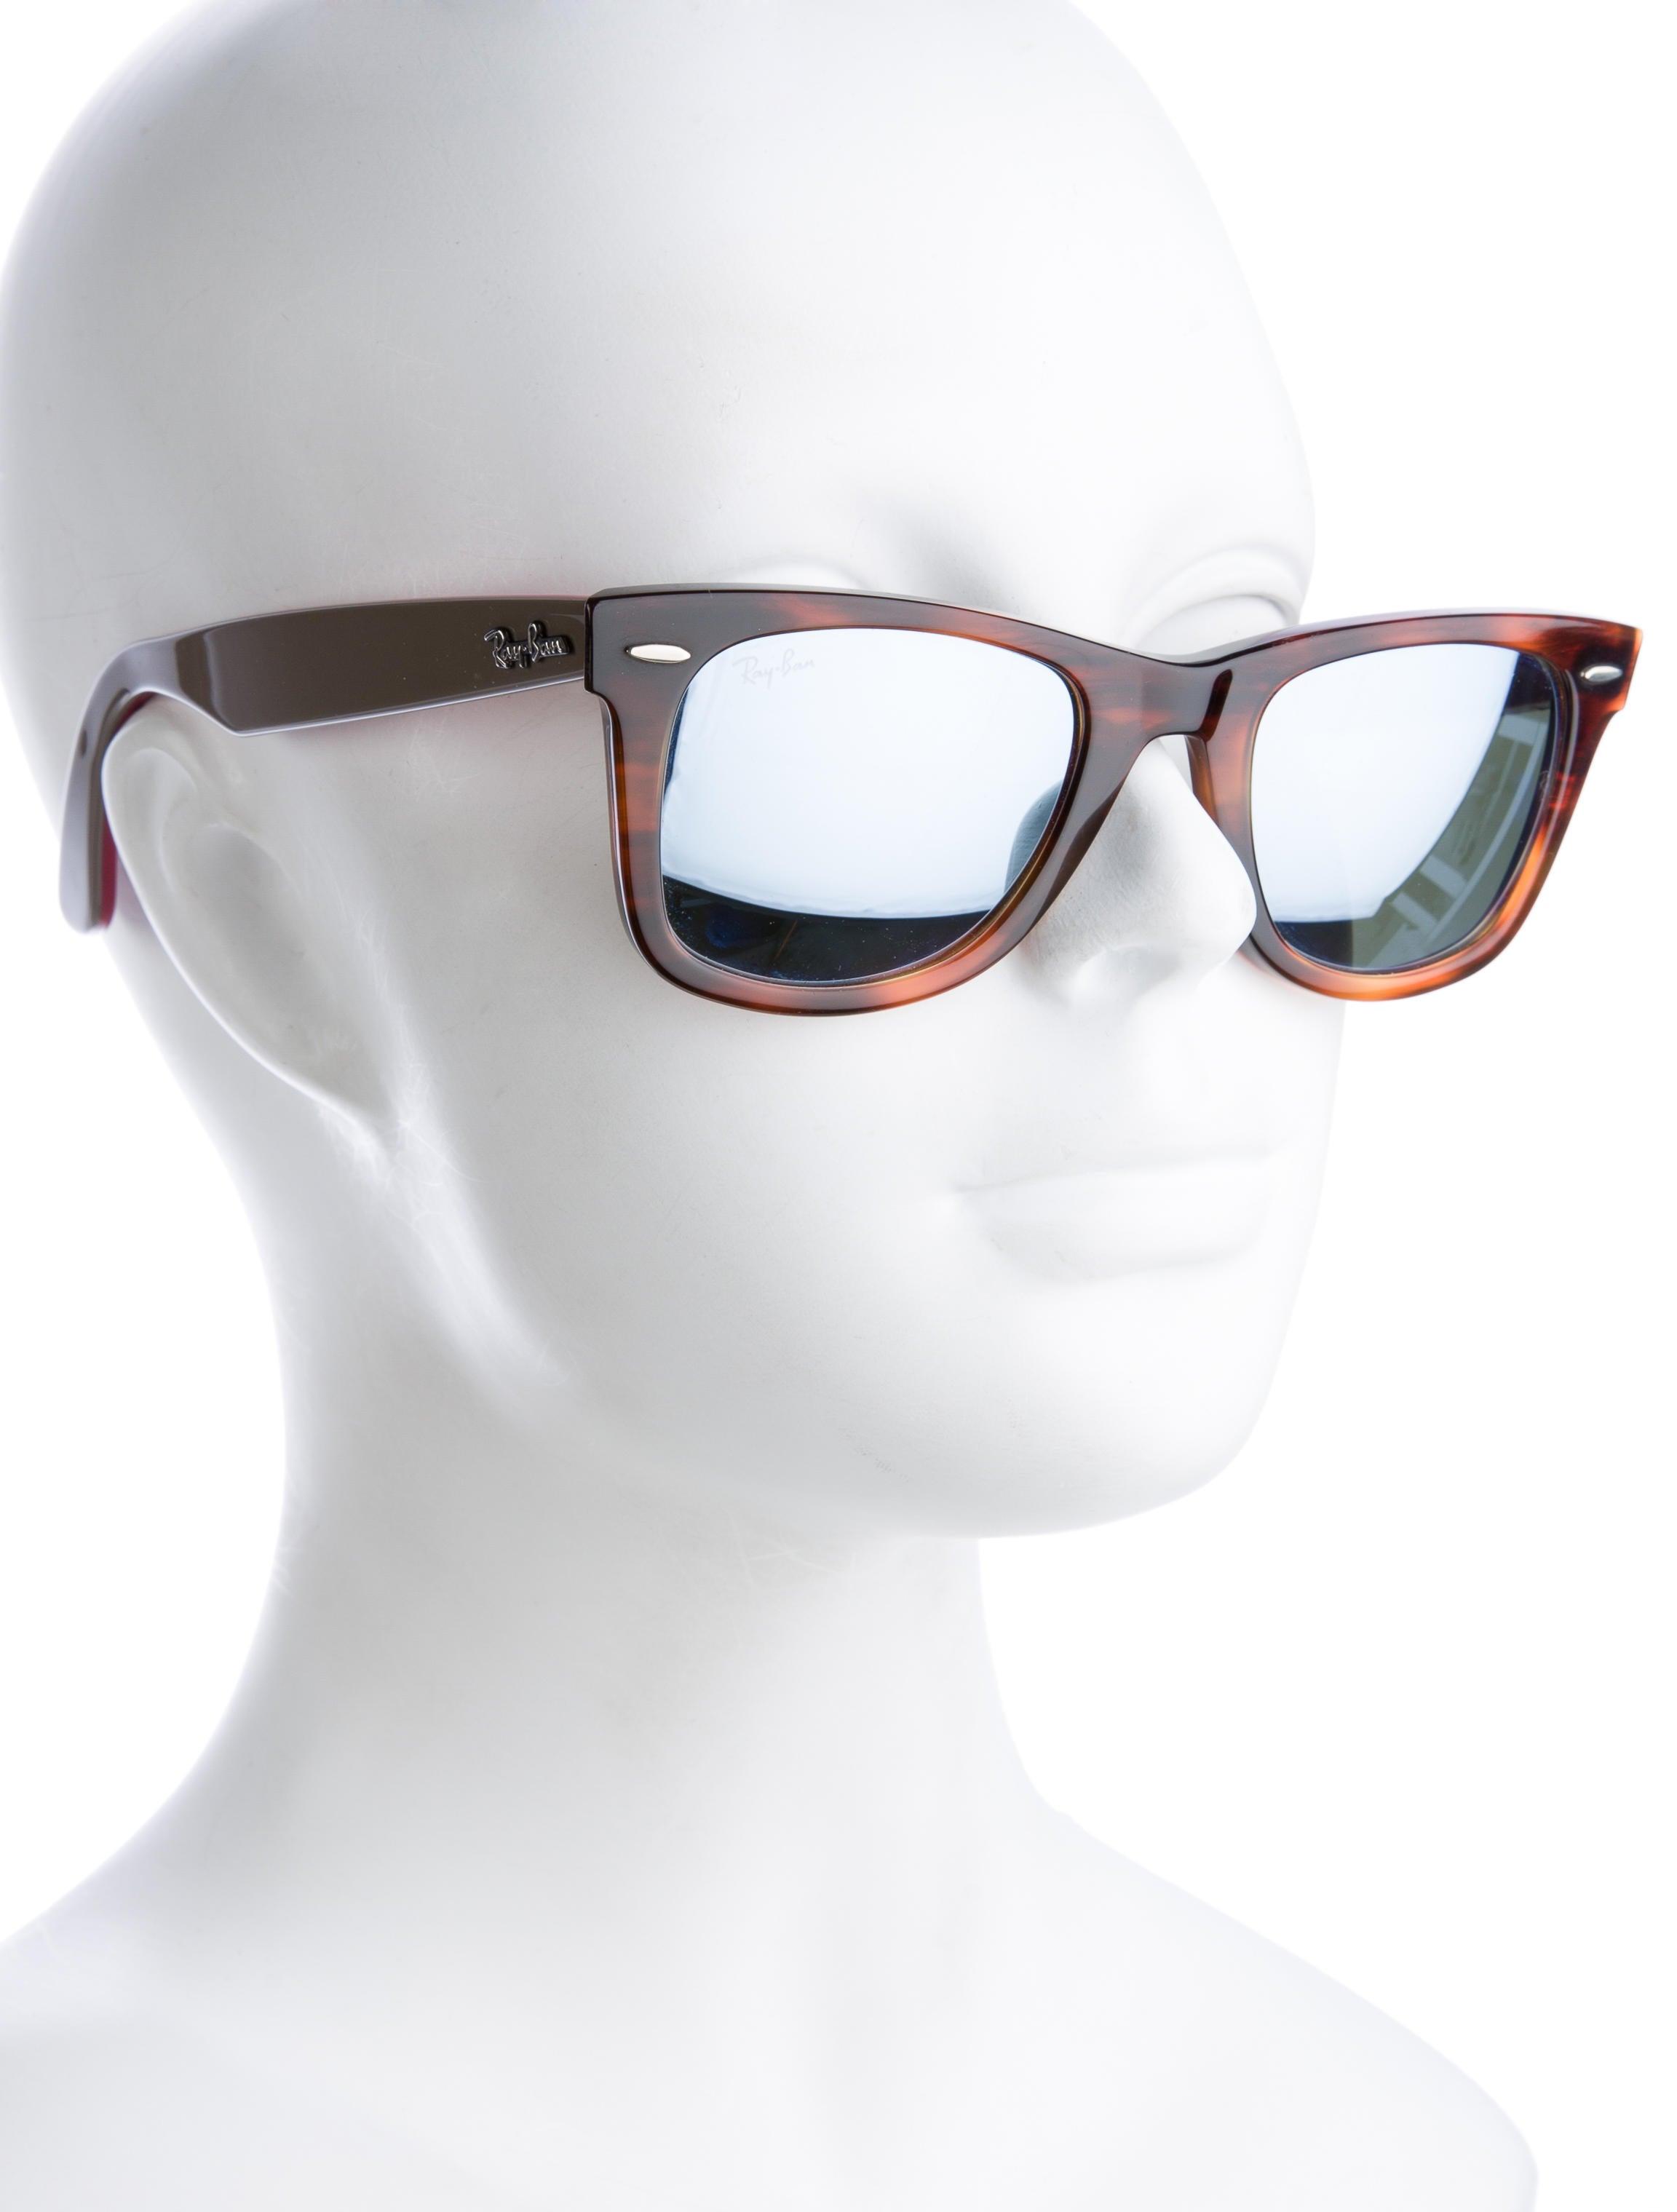 618bdf88c7 Ray-Ban Wayfarer Reflective Sunglasses - Accessories - WRX25284